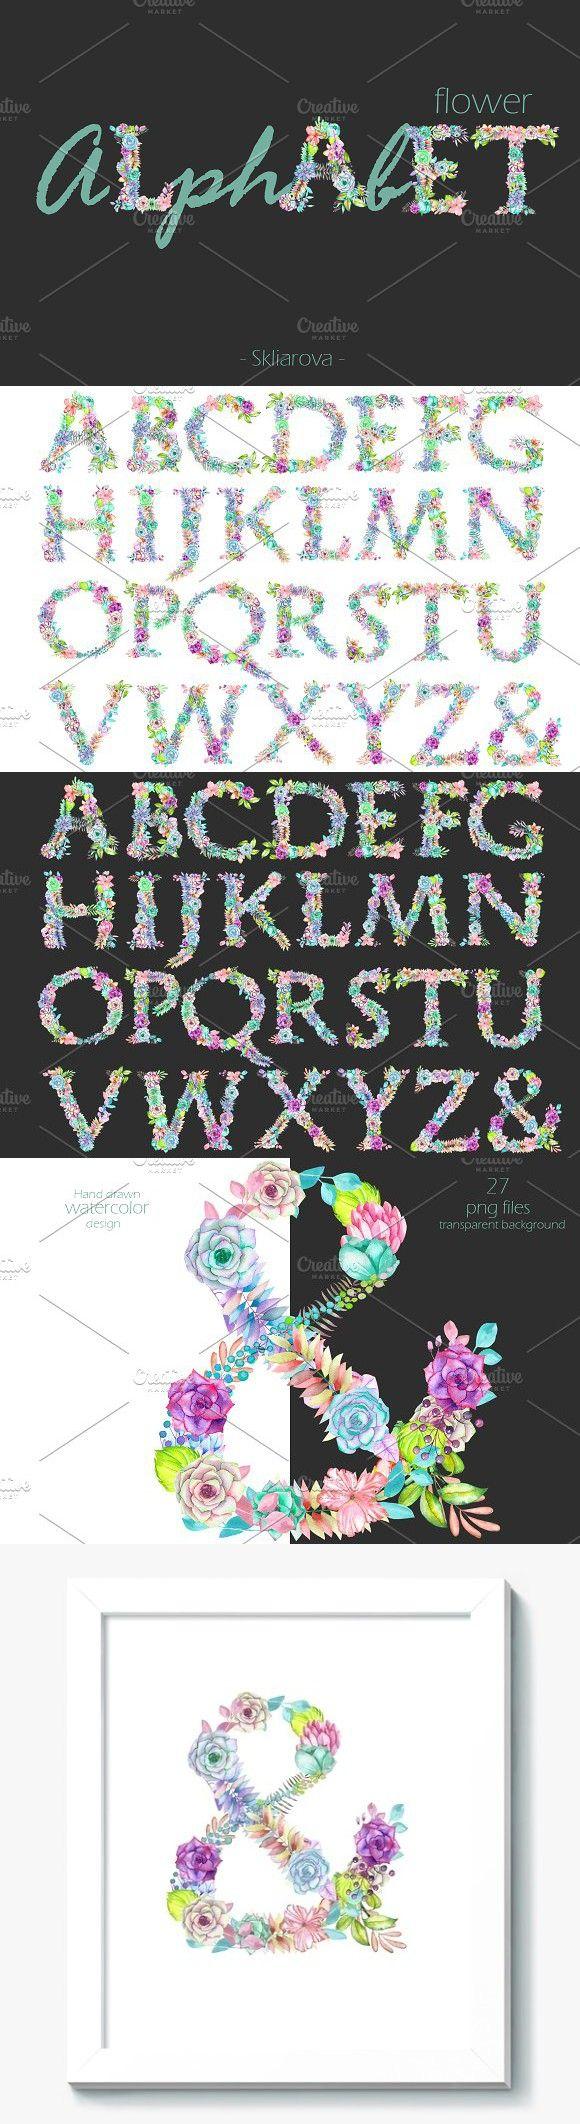 wedding card backgrounds vectors%0A Flower alphabet  Objects          Flower AlphabetFlower LettersWedding FontsWedding  CardsWedding Card TemplatesWatercolor